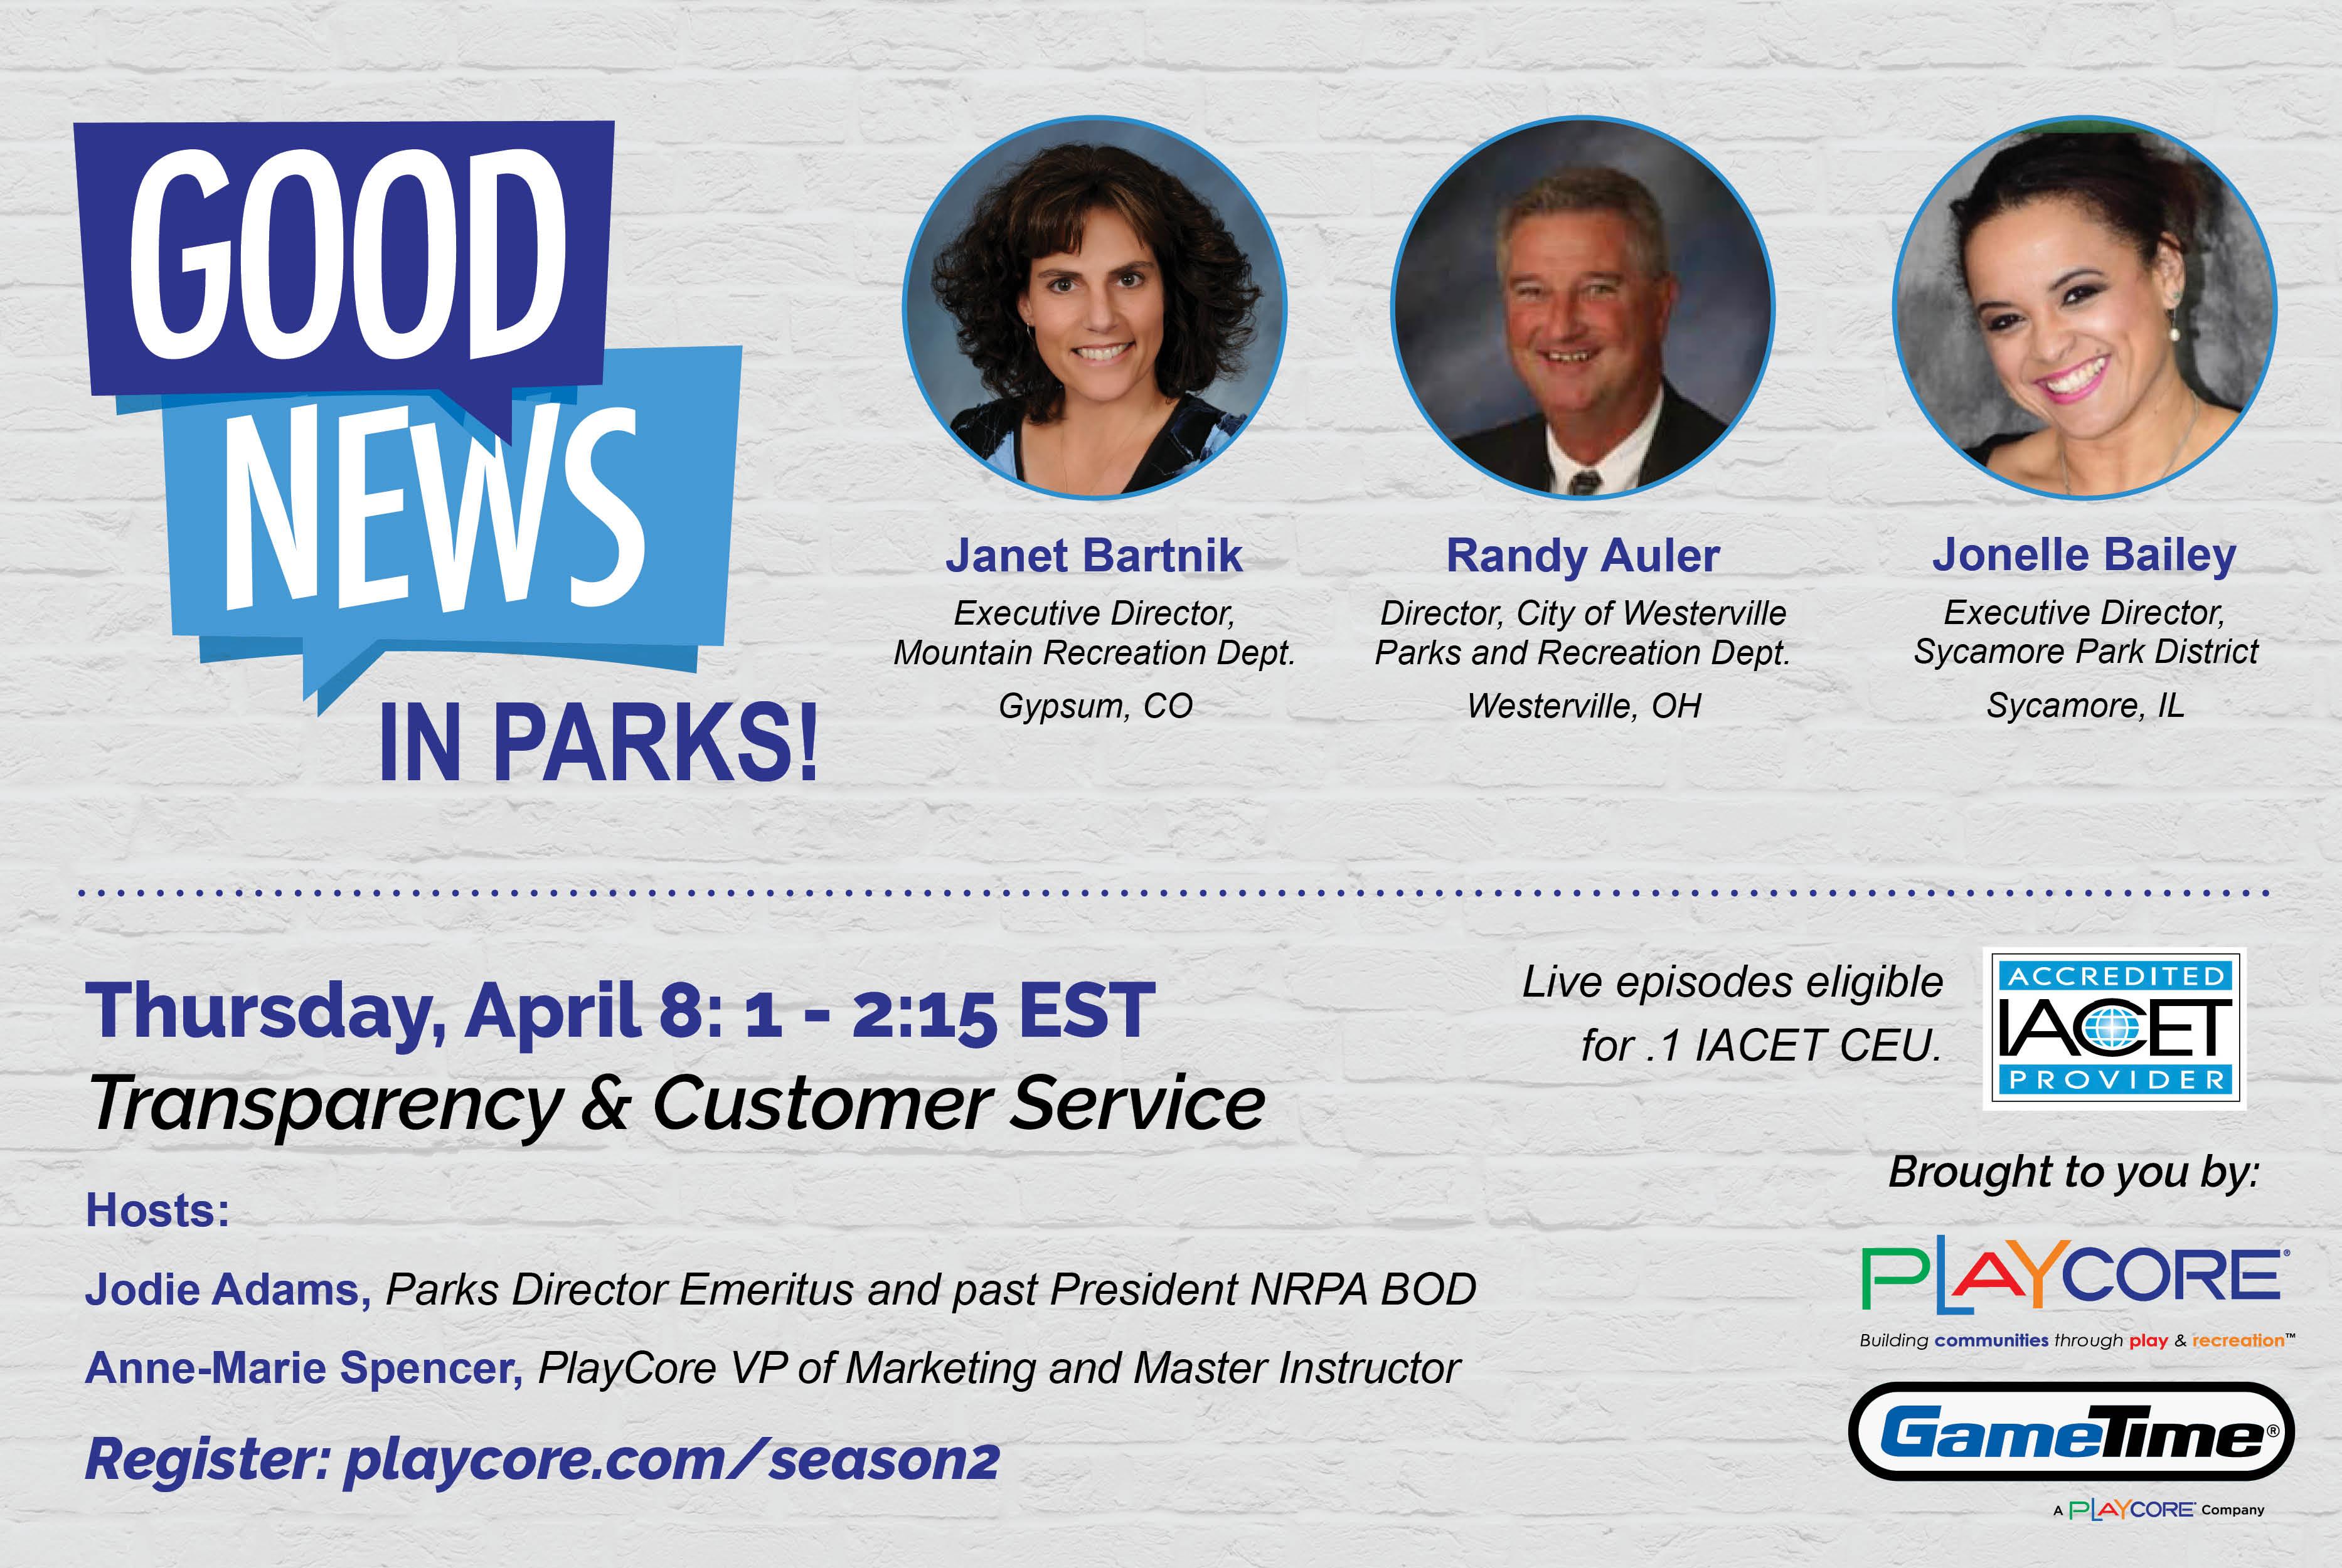 Good News in Parks - Season 2 Episode 4